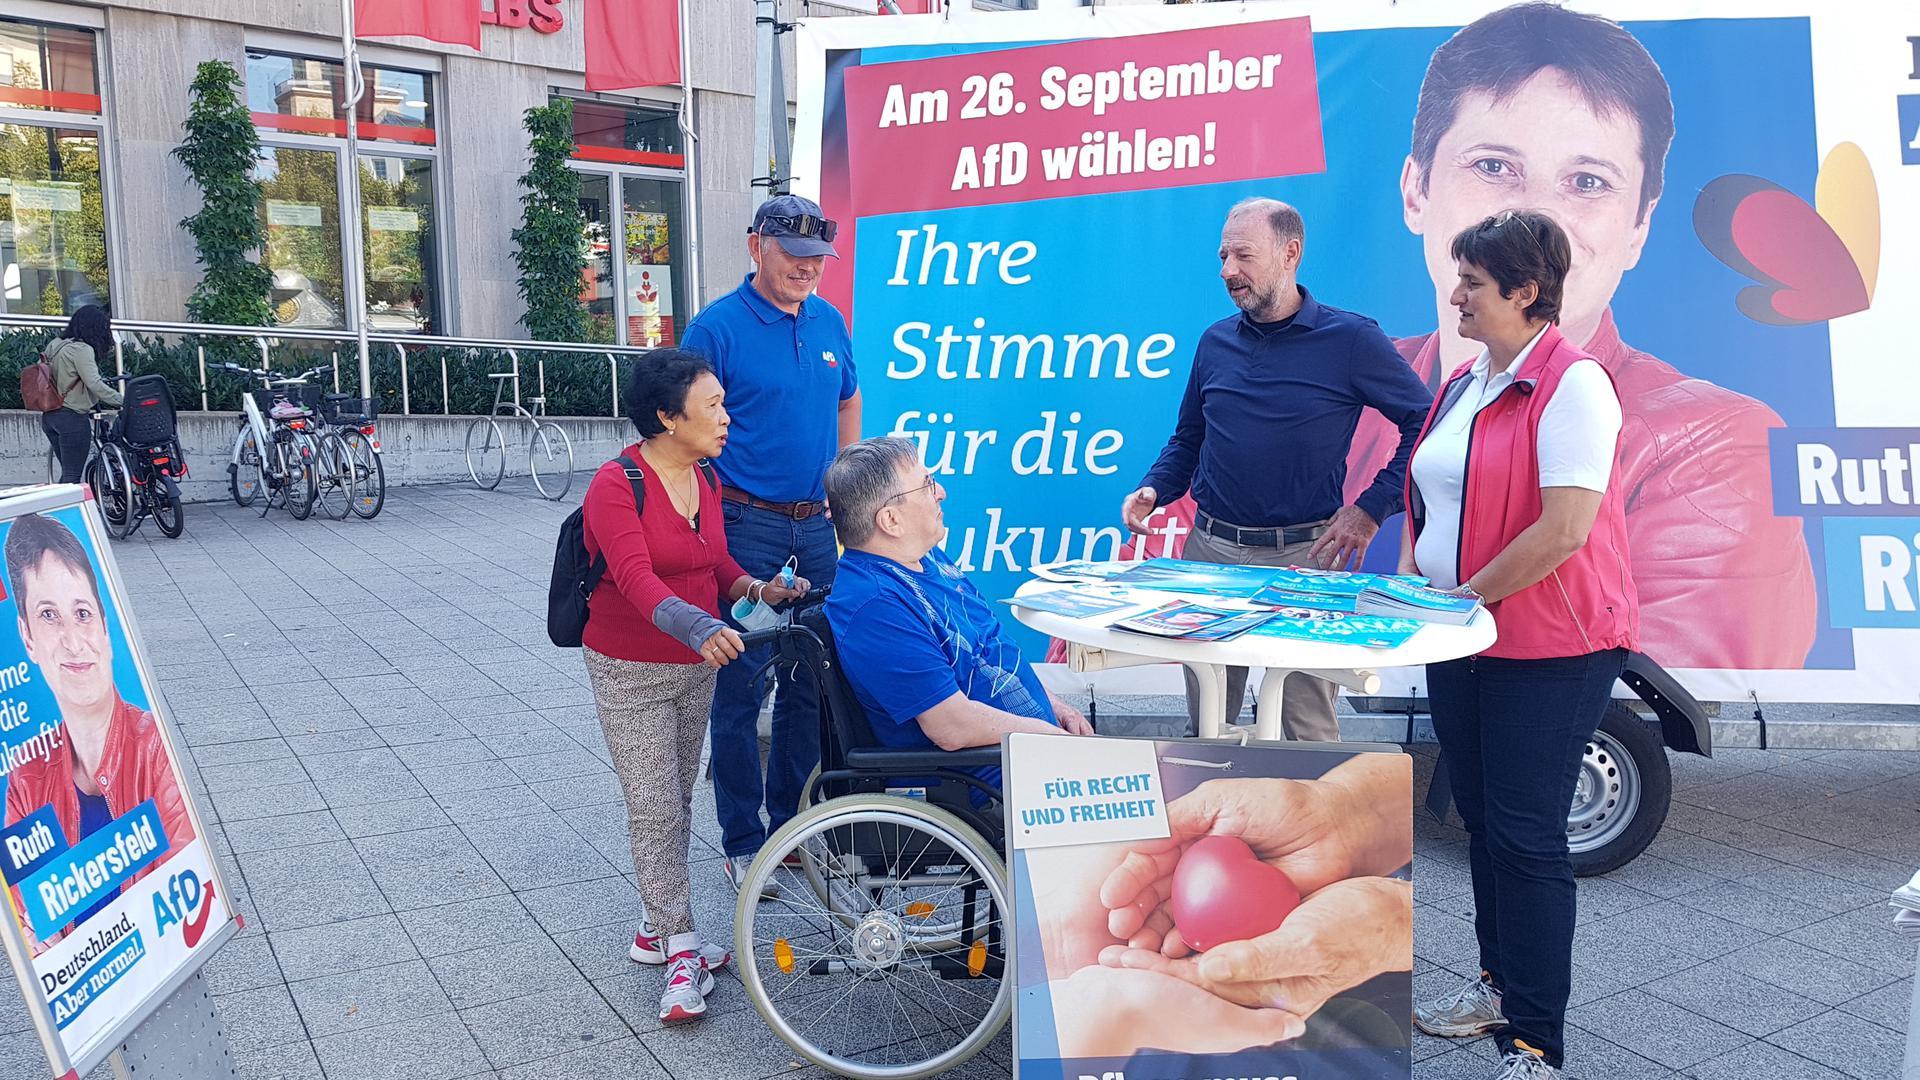 AfD-Wahlkampf in Bruchsal